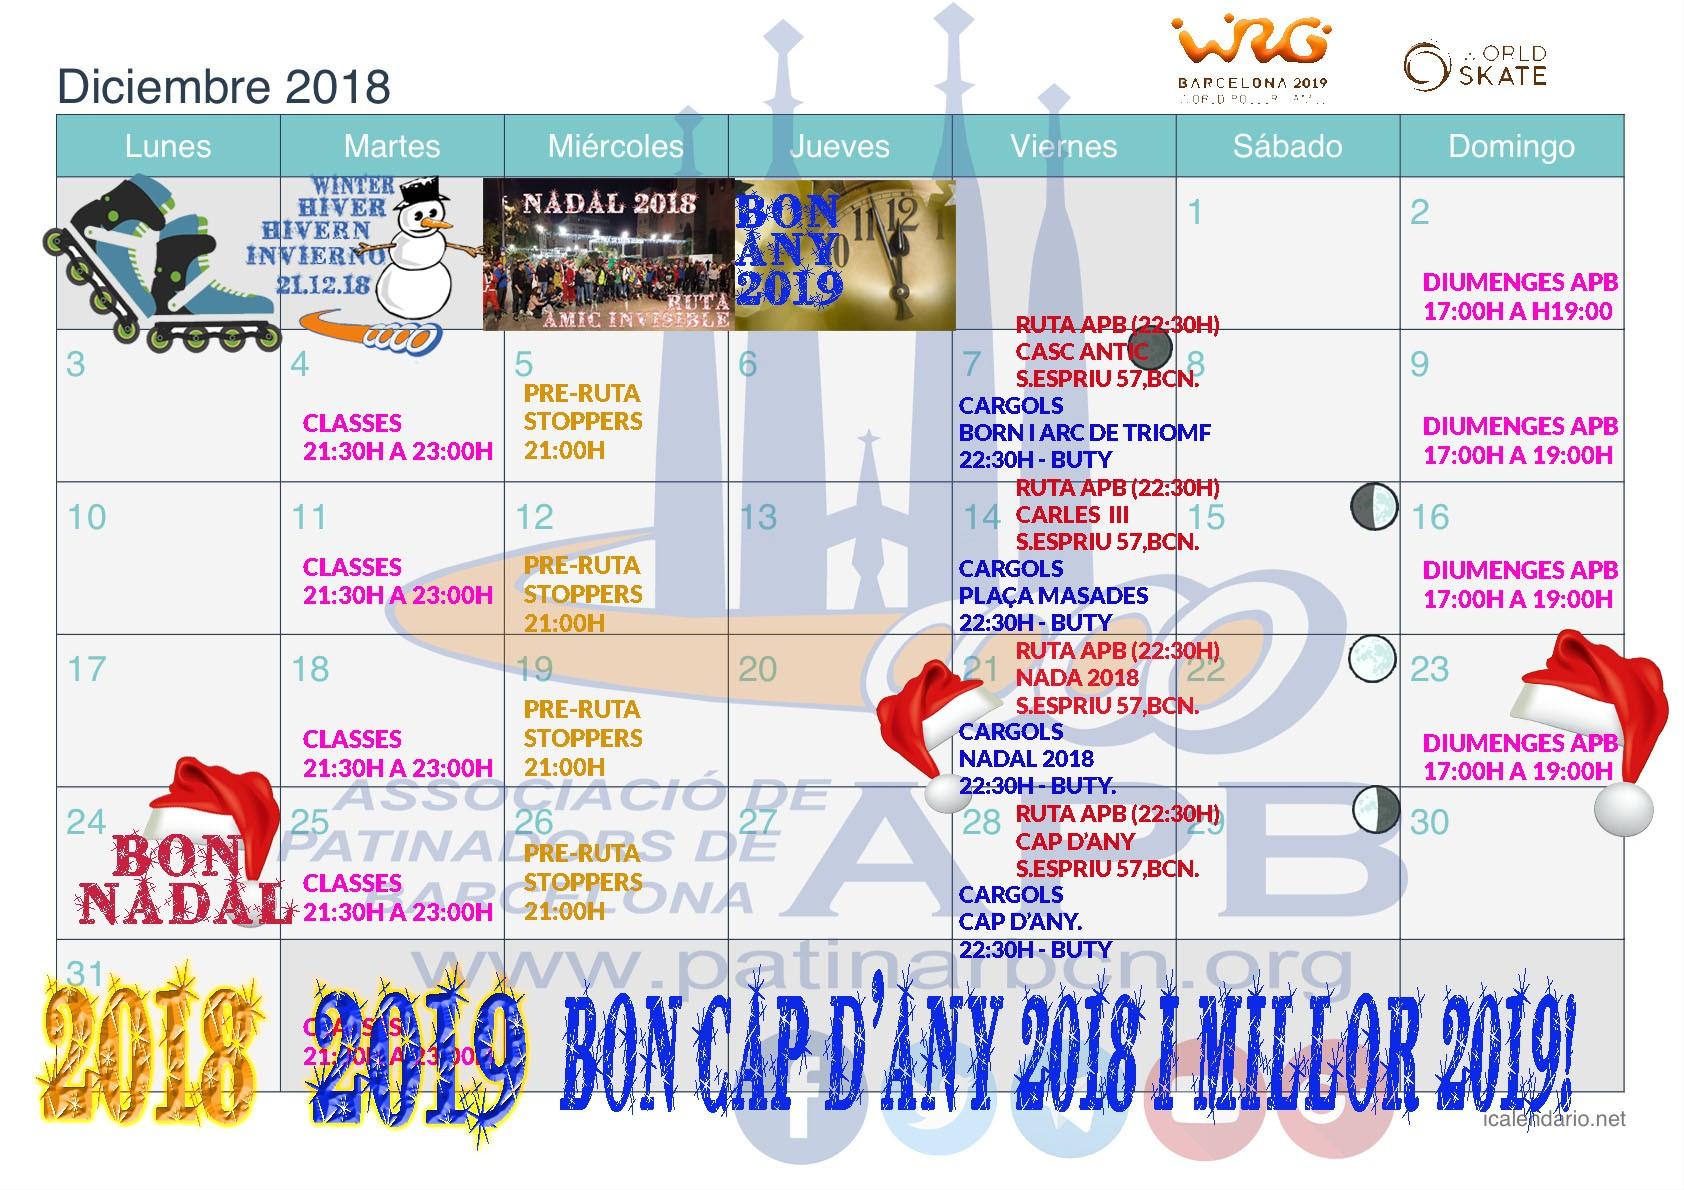 Calendario Champions 2019 Fc Barcelona Recientes Apb asociaci³n De Patinadores De Barcelona